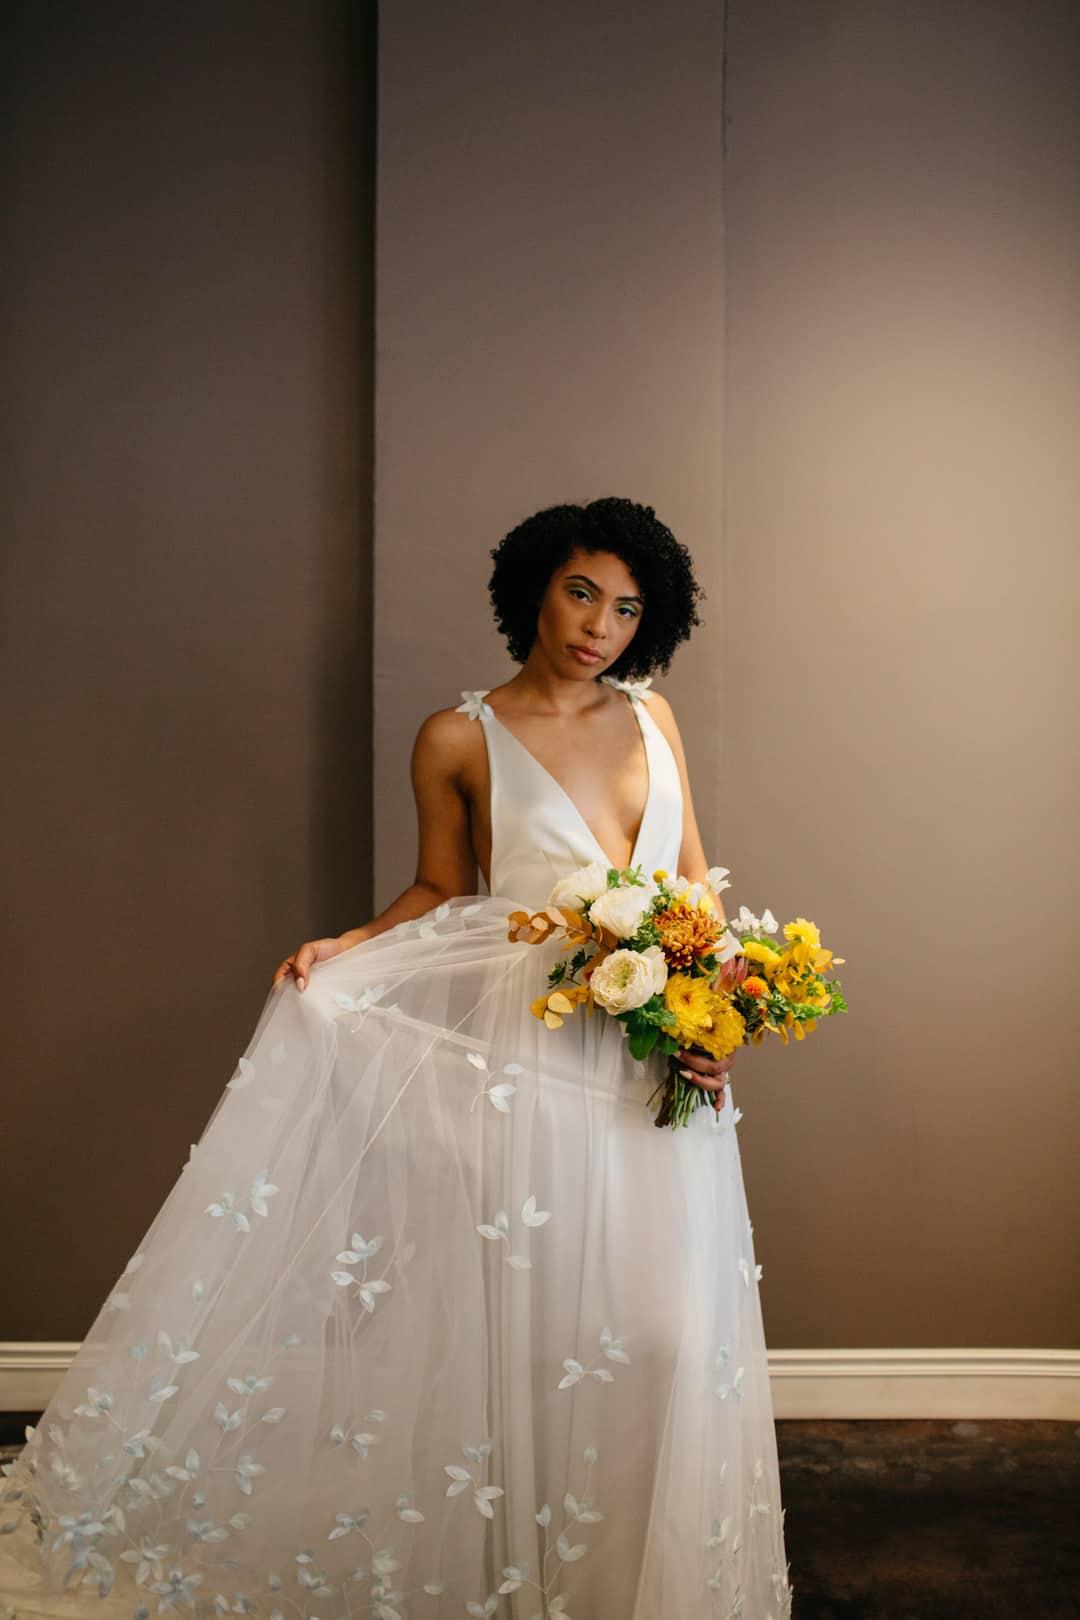 WES ANDERSON TRAVEL THEMED WEDDING IDEAS | Bespoke-Bride